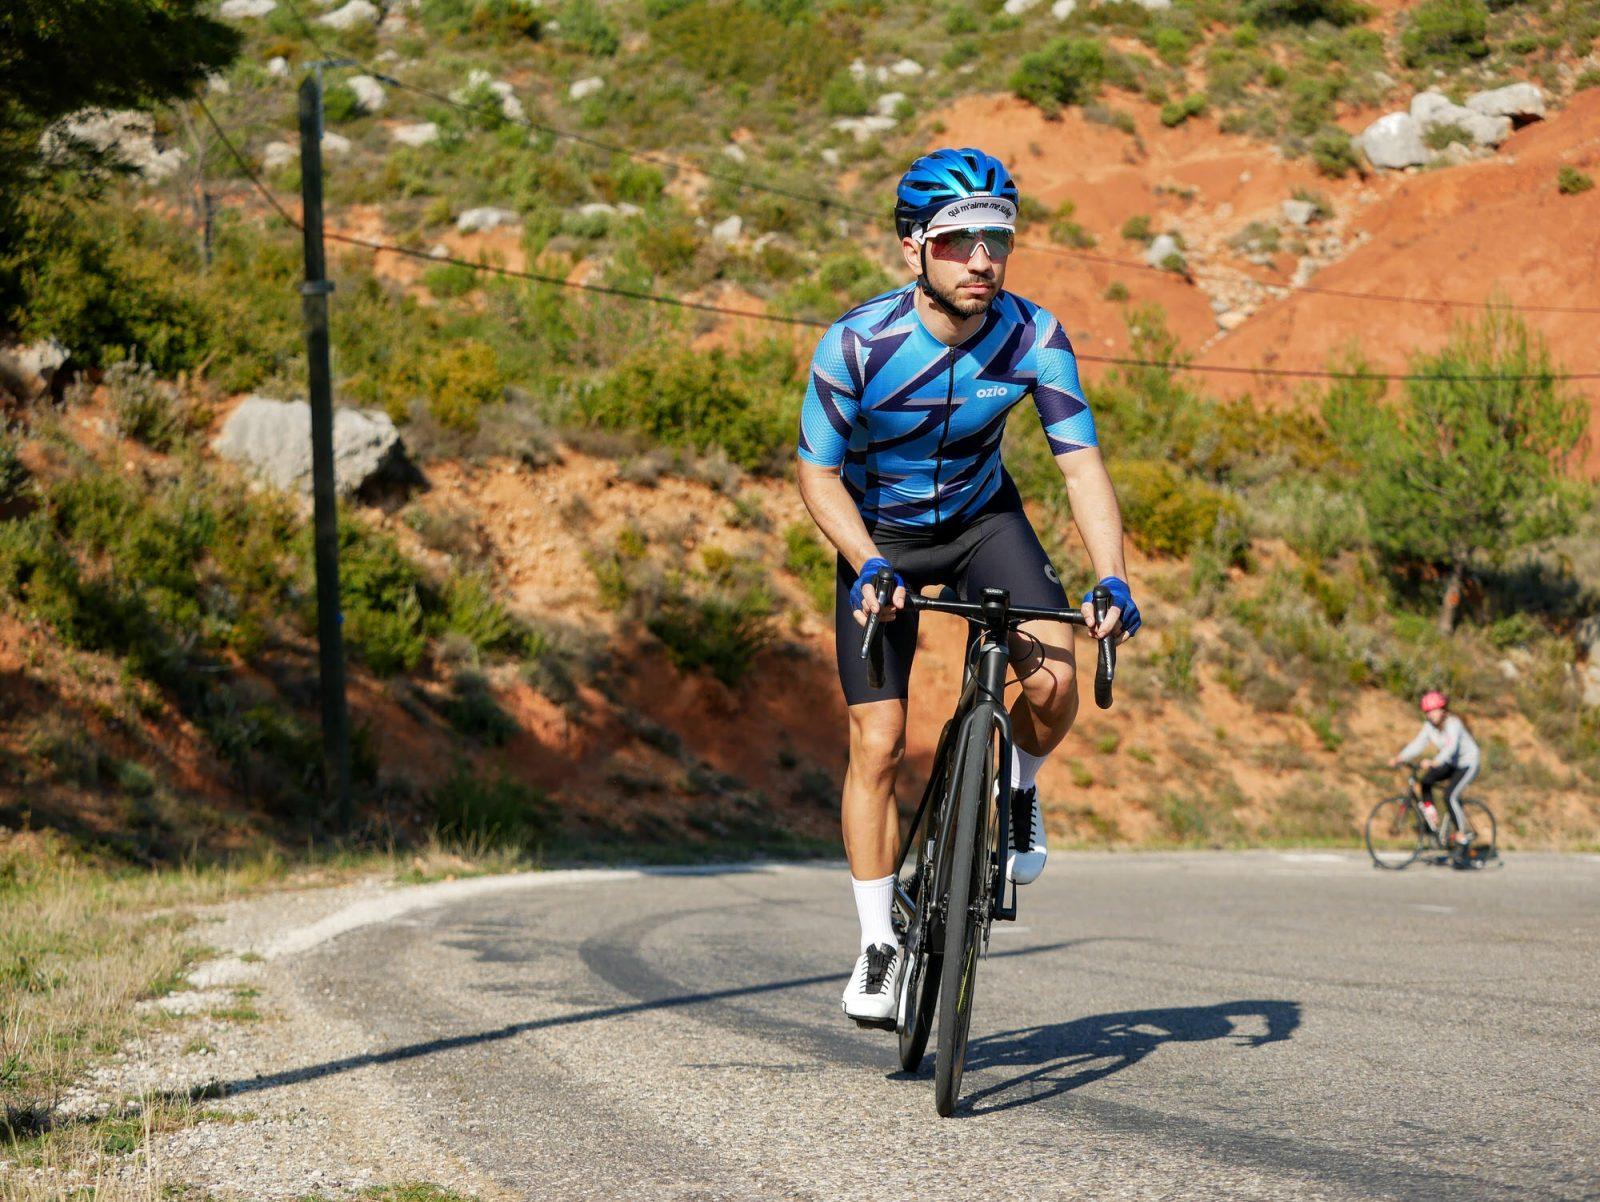 Maillot de vélo manches courtes été bleu OZIO